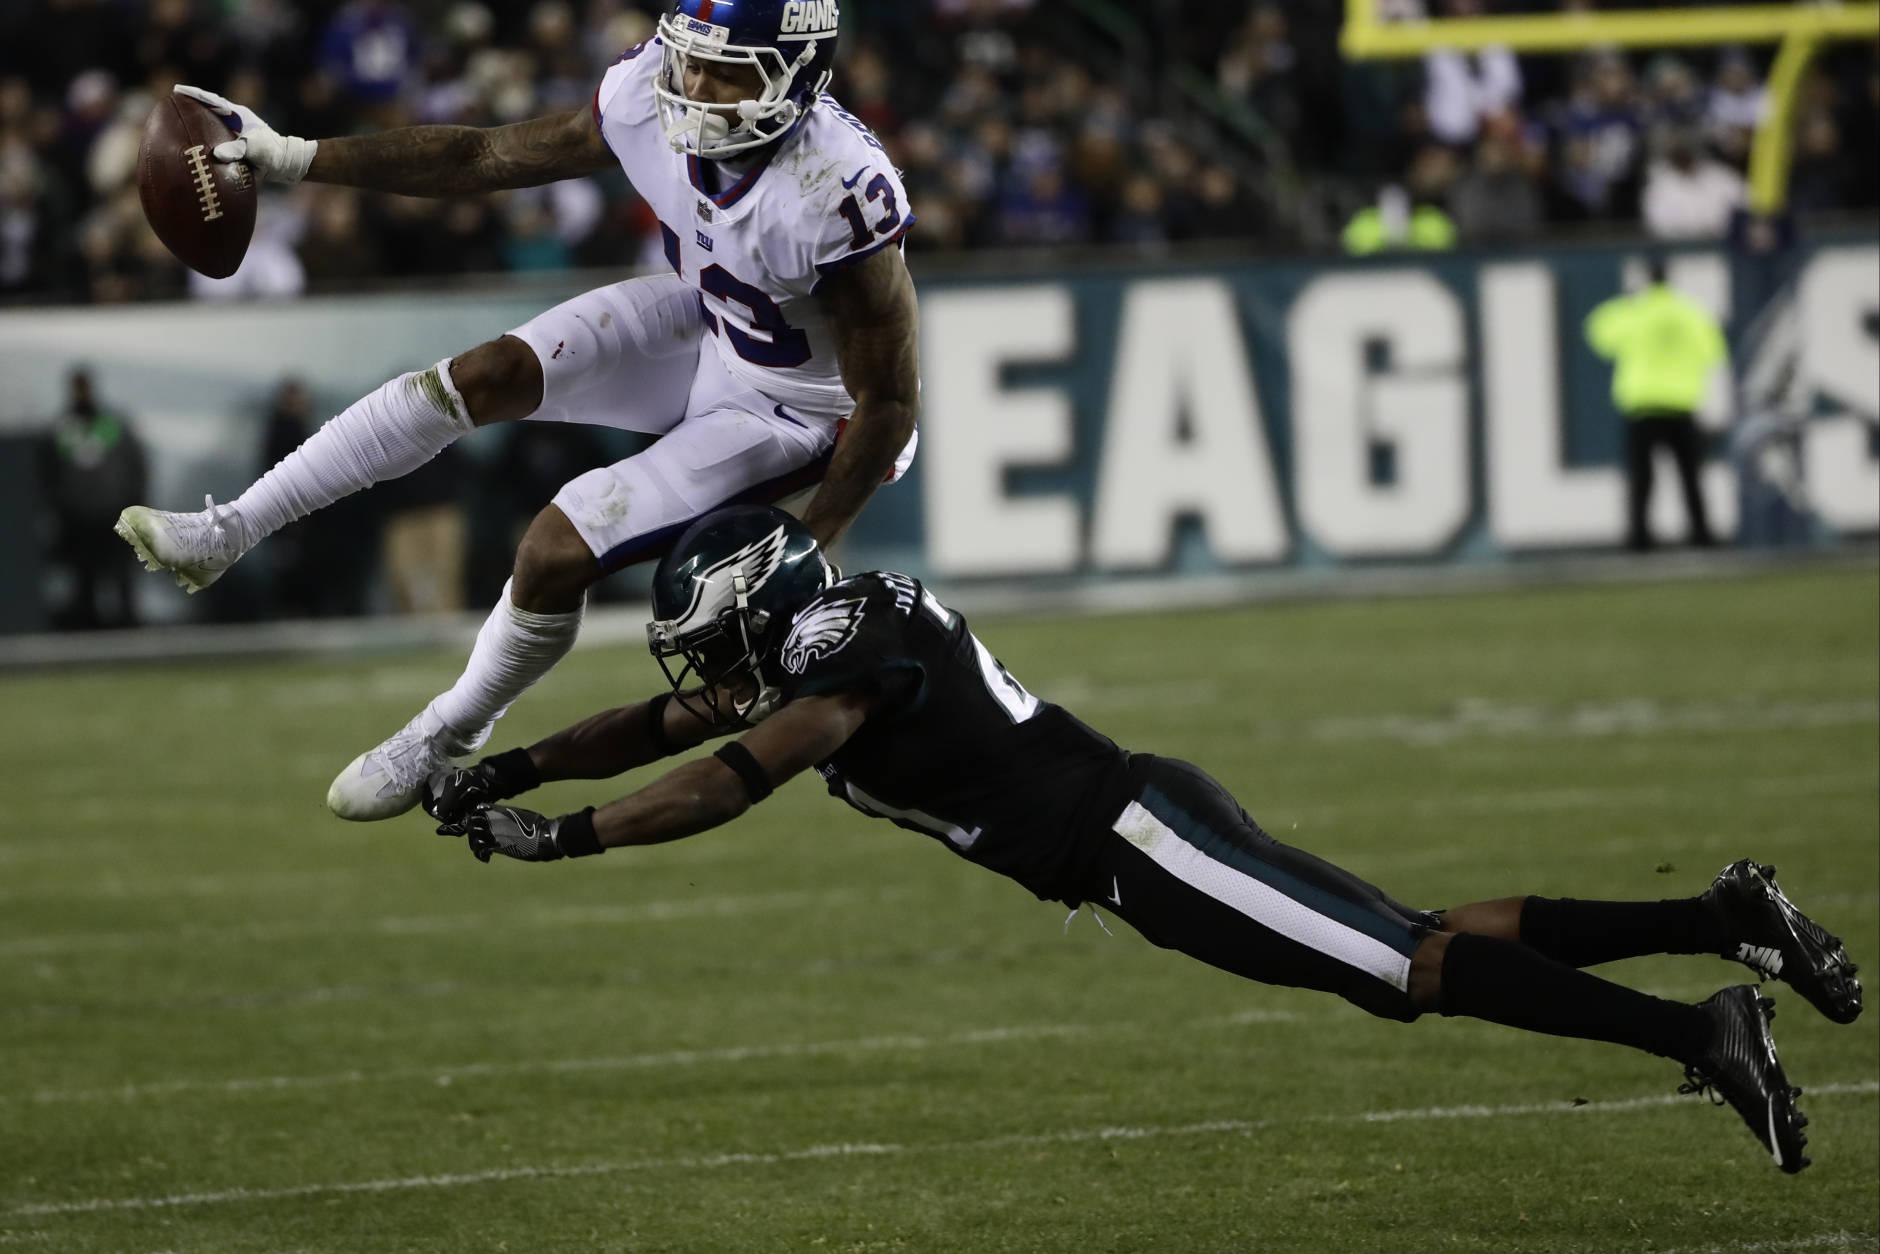 New York Giants' Odell Beckham (13) is hit by Philadelphia Eagles' Leodis McKelvin (21) during the second half of an NFL football game, Thursday, Dec. 22, 2016, in Philadelphia. (AP Photo/Michael Perez)